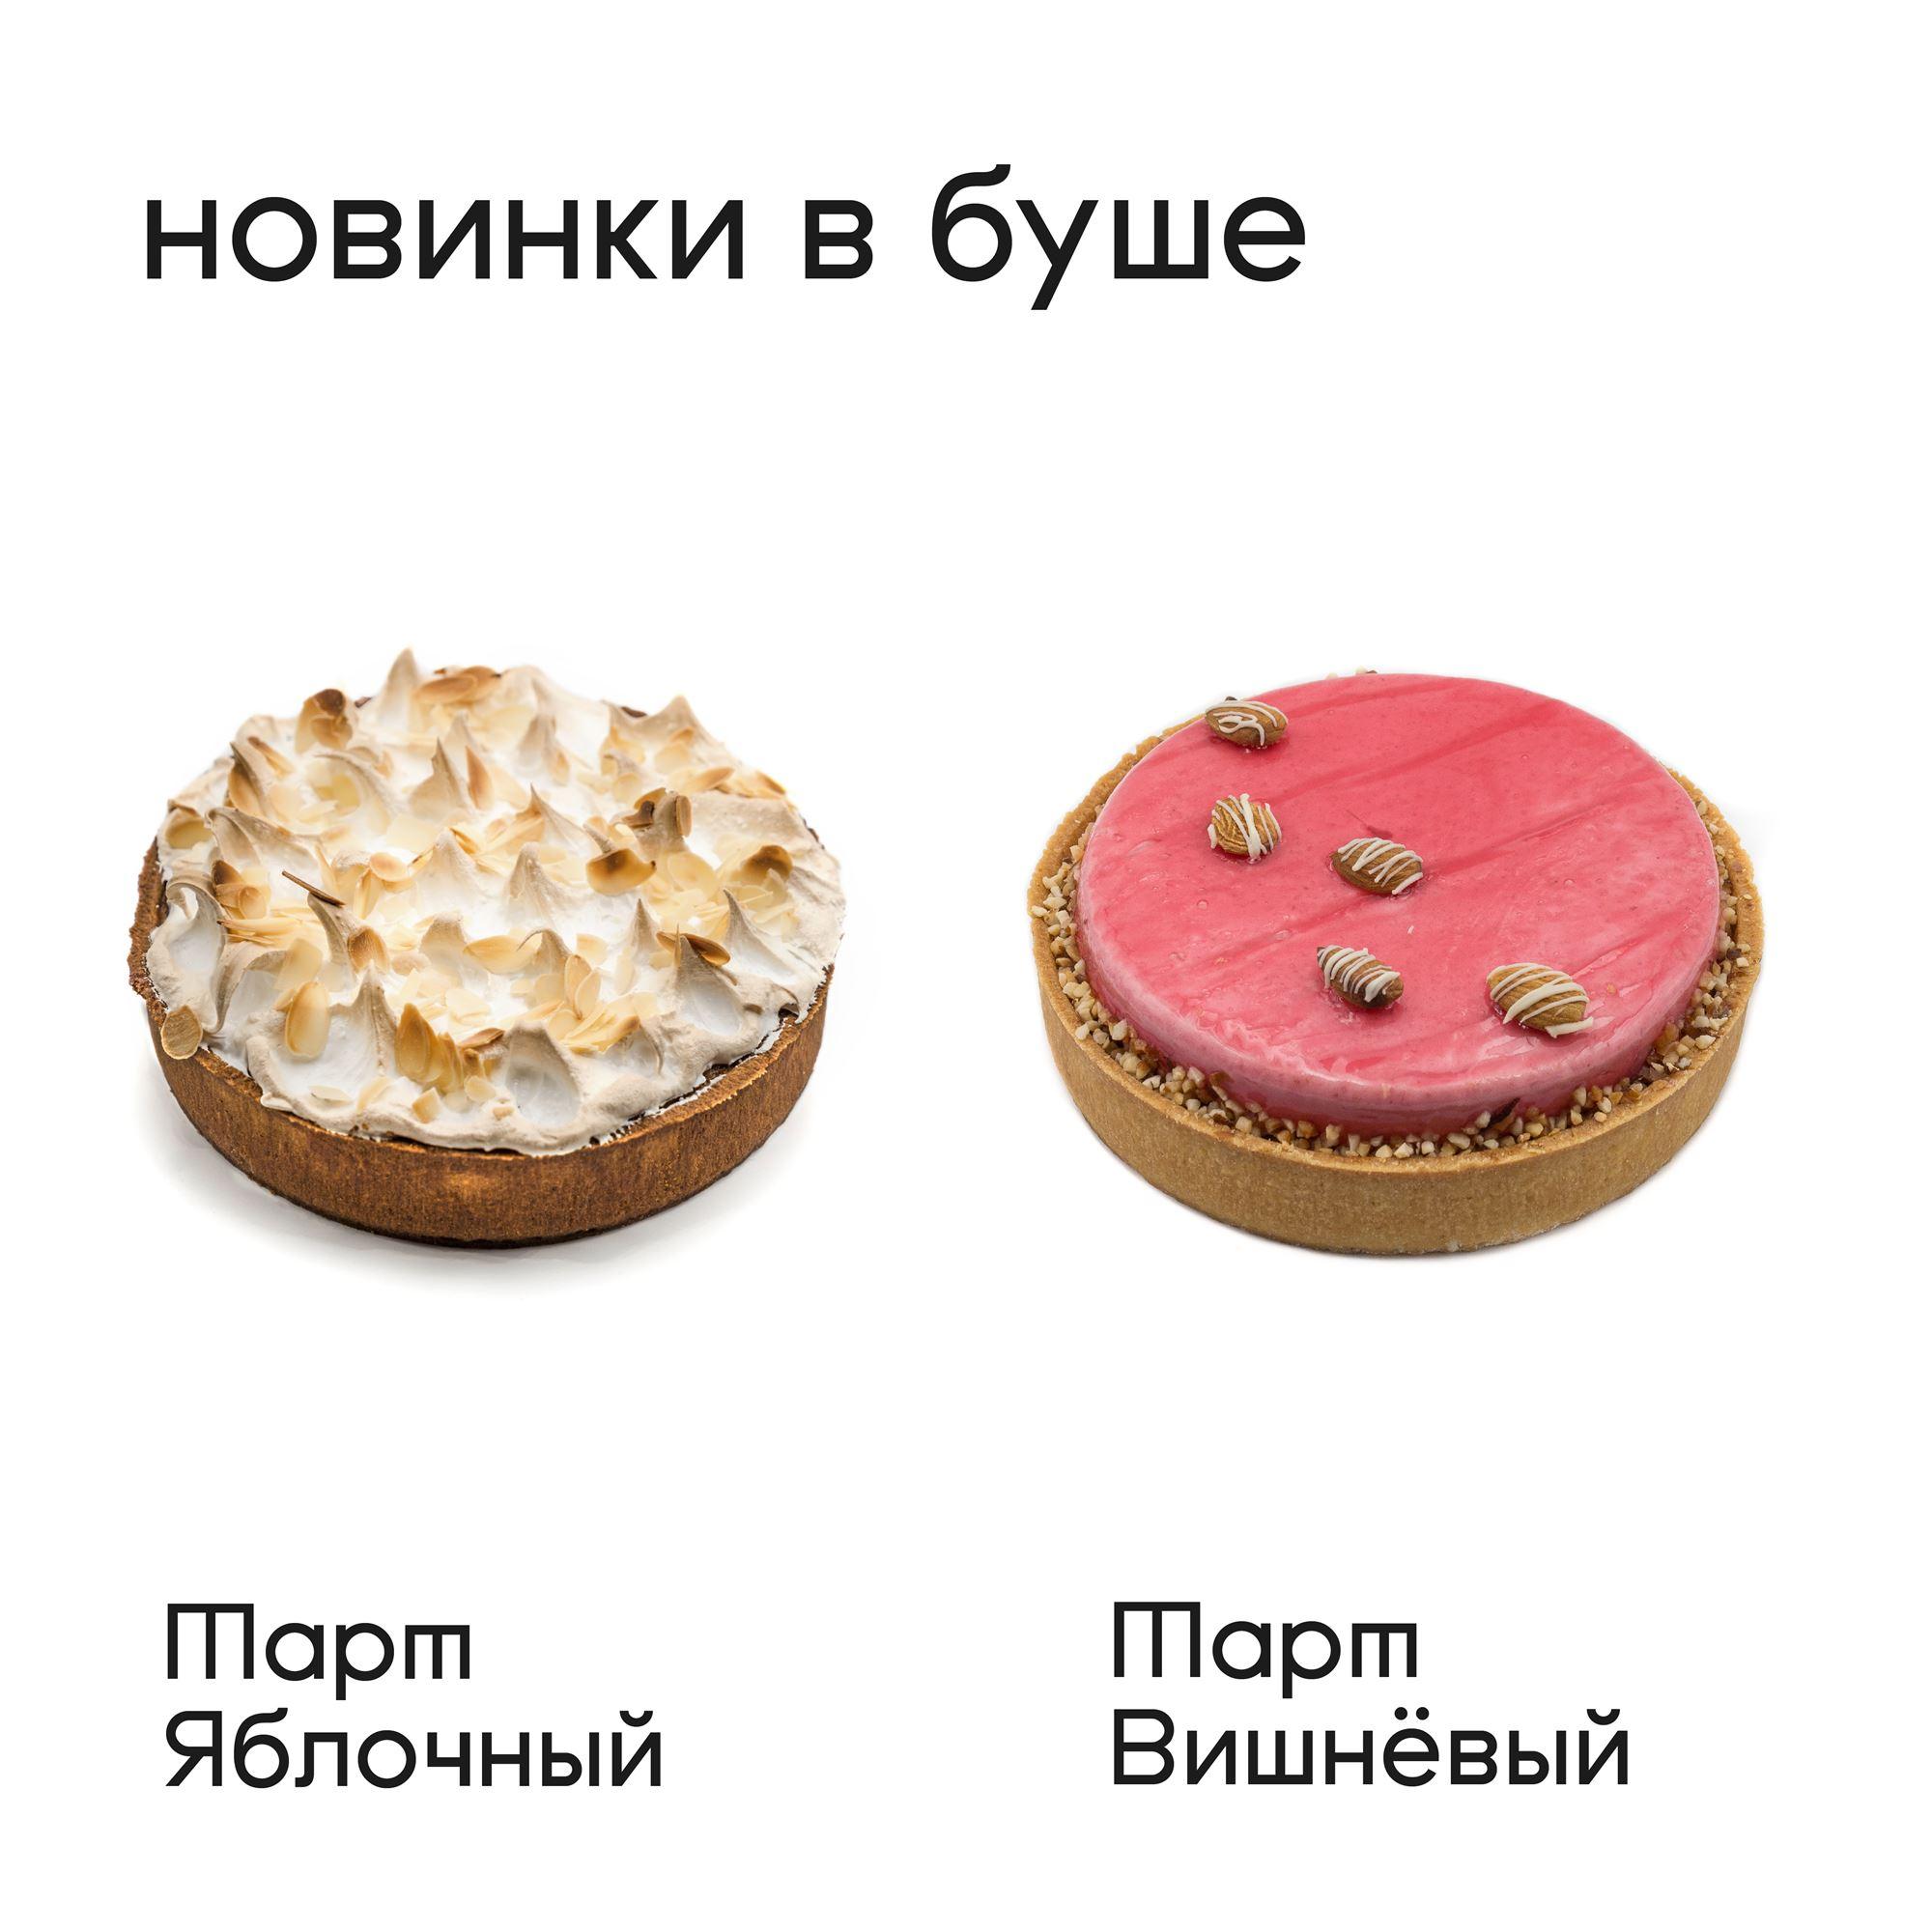 Новинки – Тарт Яблочный и Тарт Вишневый